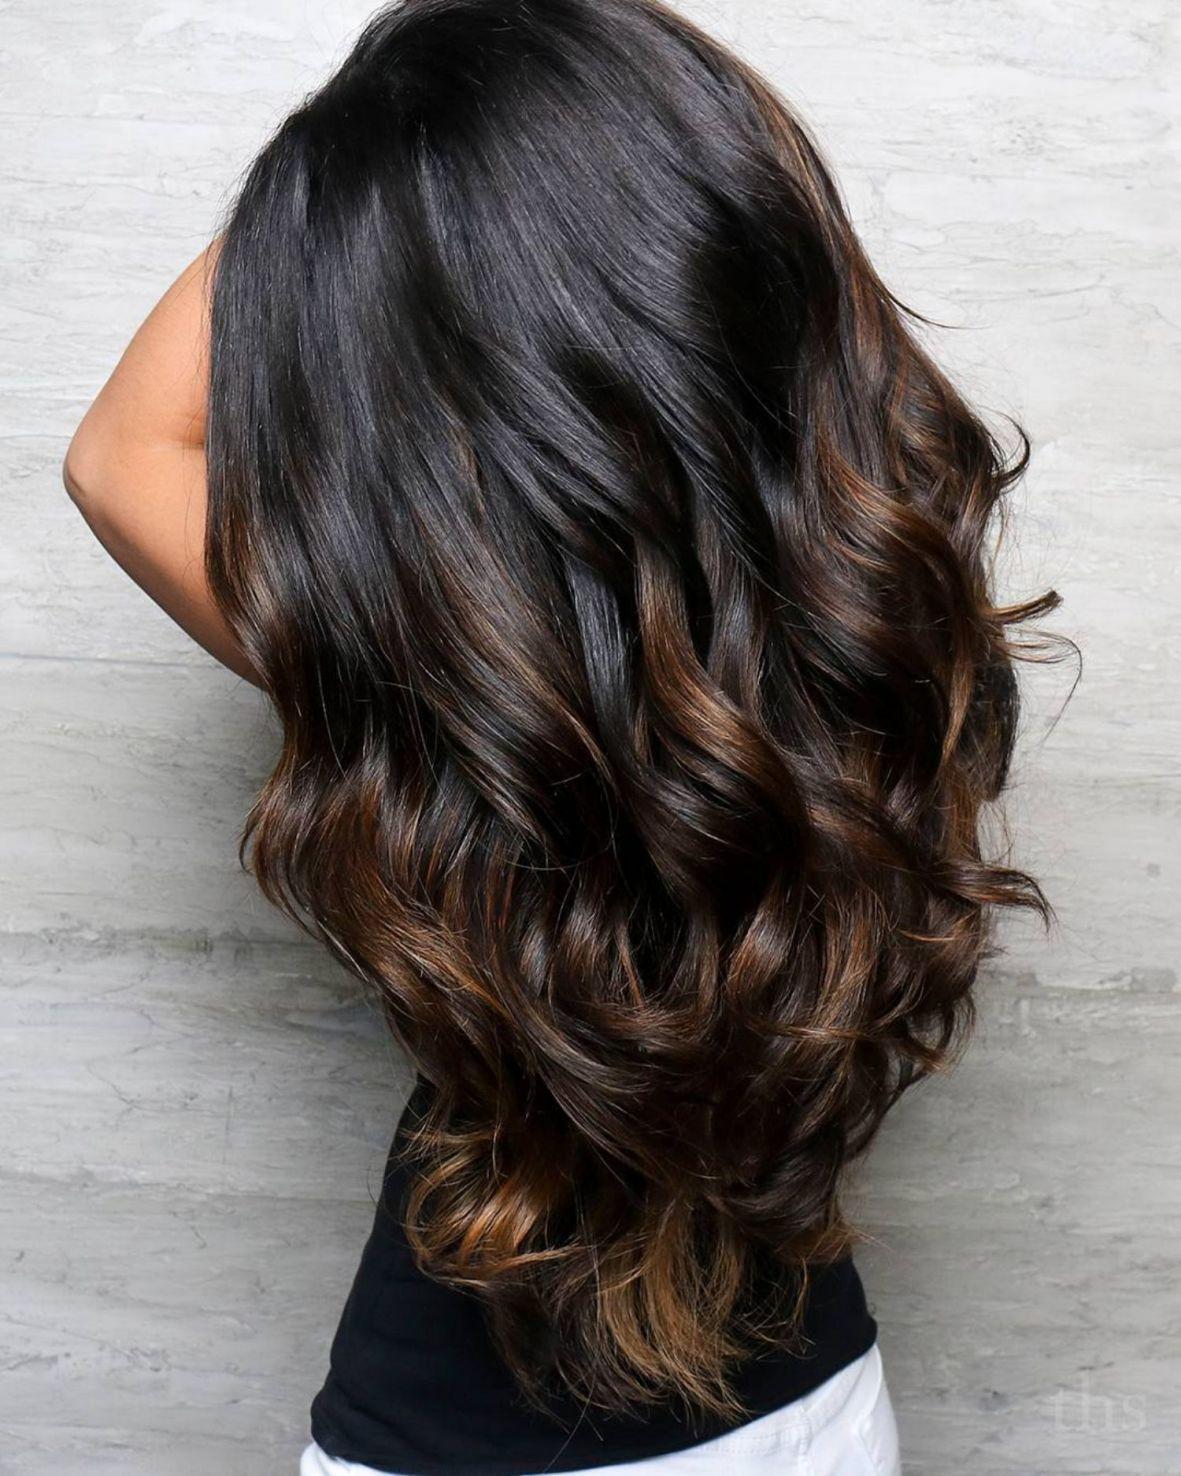 60 Hairstyles Featuring Dark Brown Hair With Highlights In 2020 Black Hair Balayage Balayage Hair Hair Styles